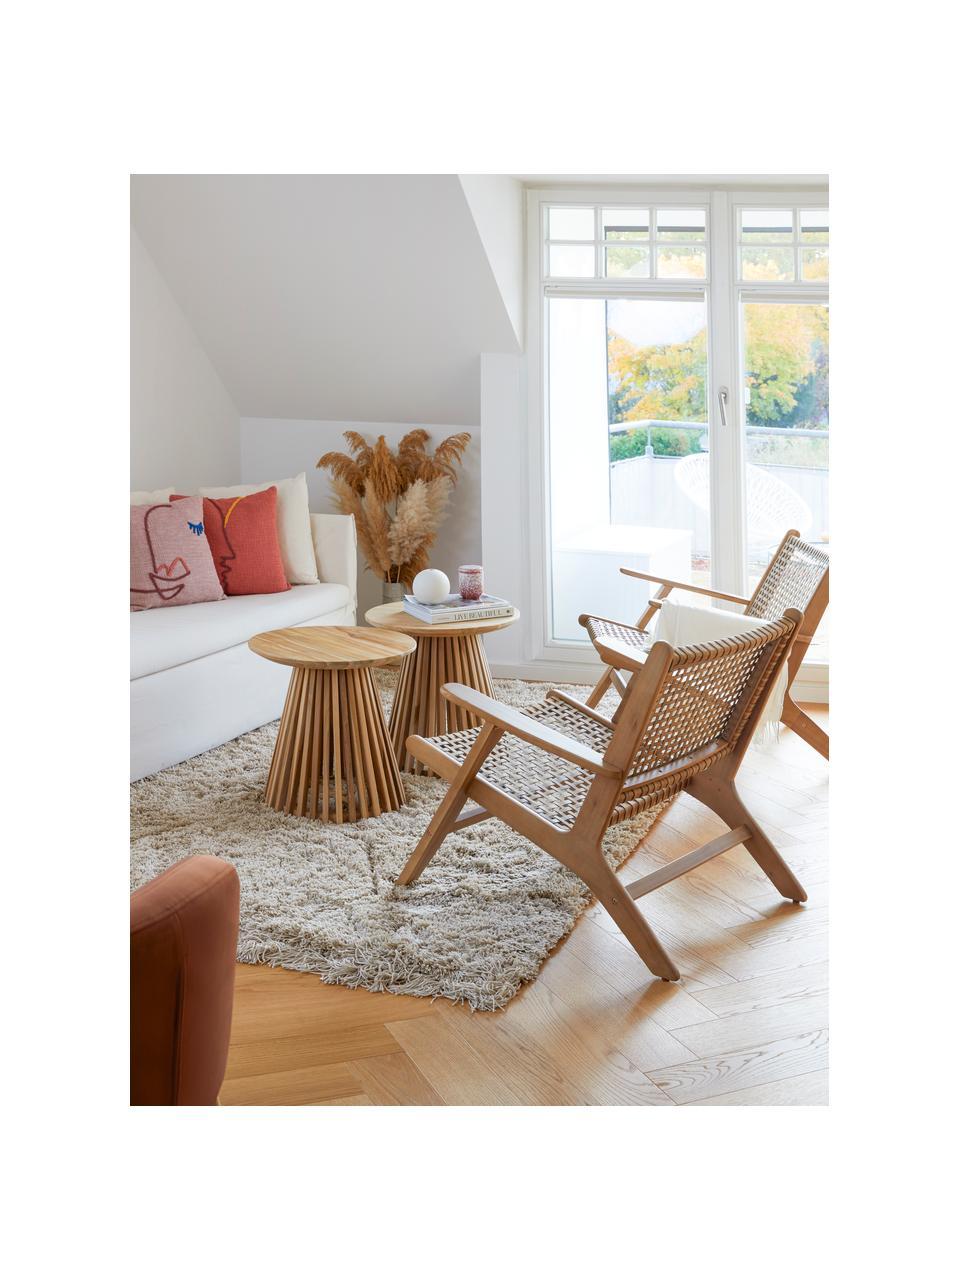 Loungefauteuil Noon met rotan vlechtwerk, Frame: massief acaciahout, Acaciahout, B 68 x D 80 cm